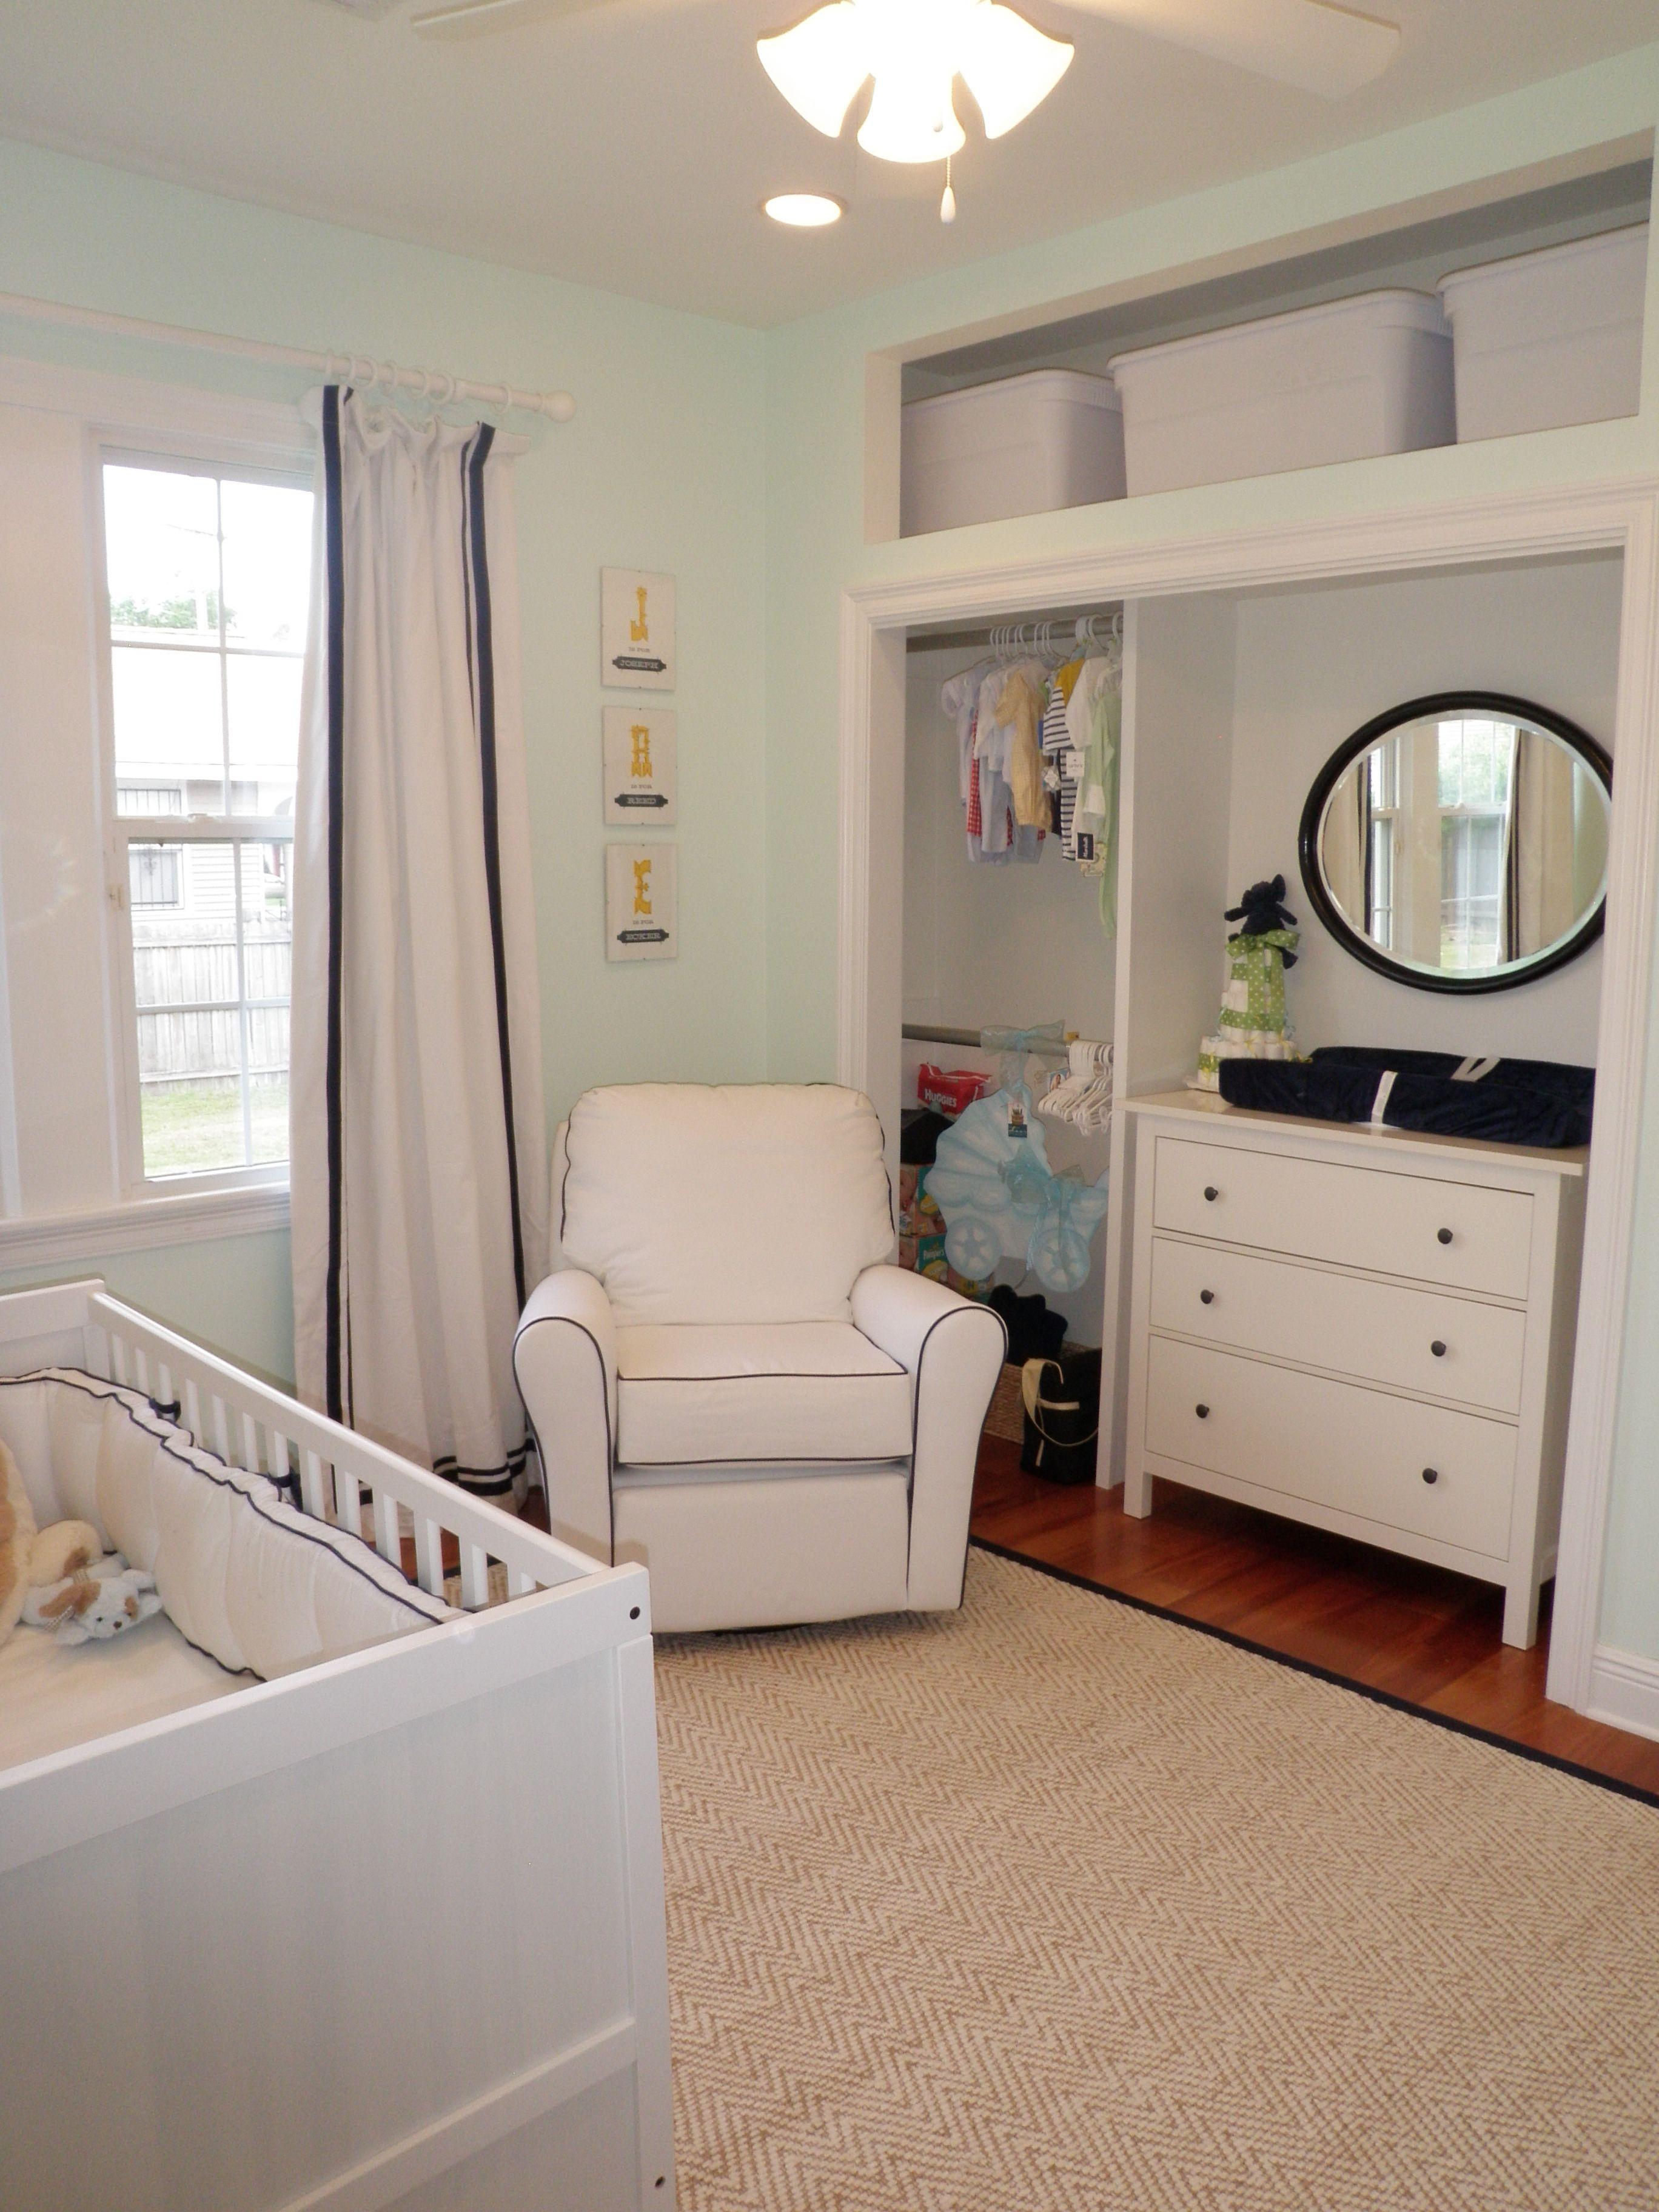 Finished Nursery! Ikea Hemnes Dresser, Little Castle Cottage Glider, PB Kids Chenille Jute Rug